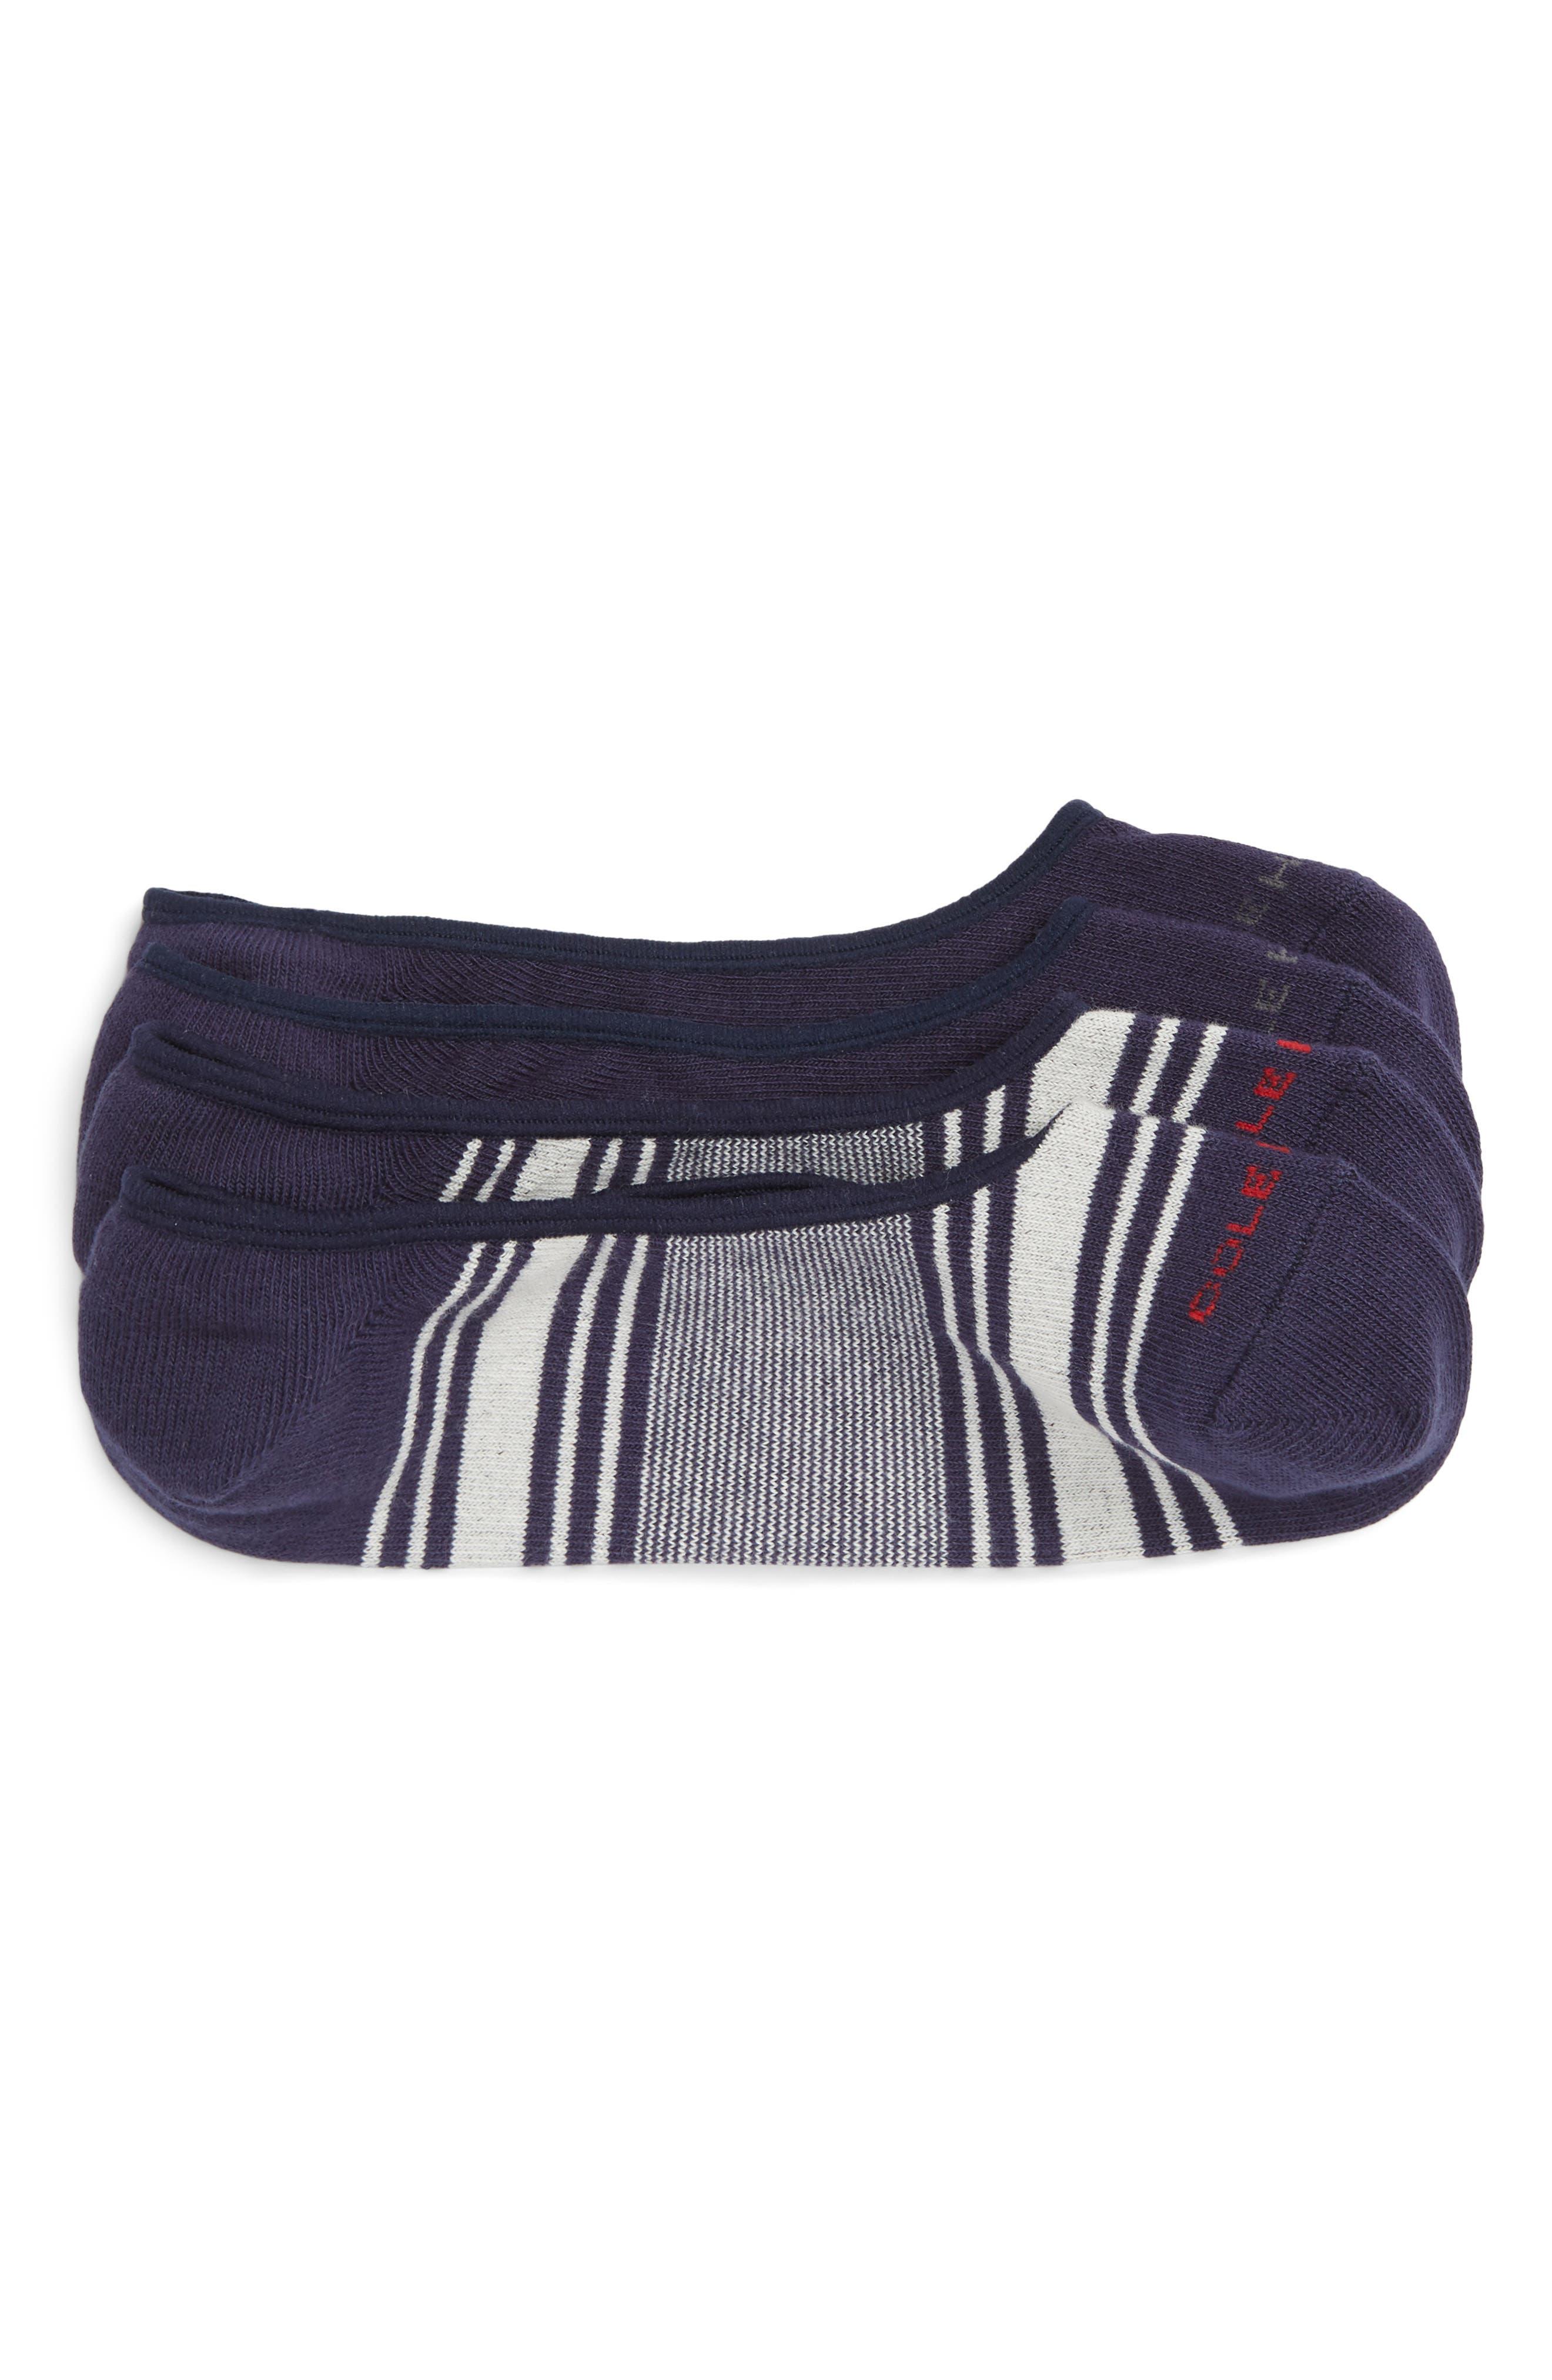 2-Pack No-Show Socks,                         Main,                         color, GREY MULTI